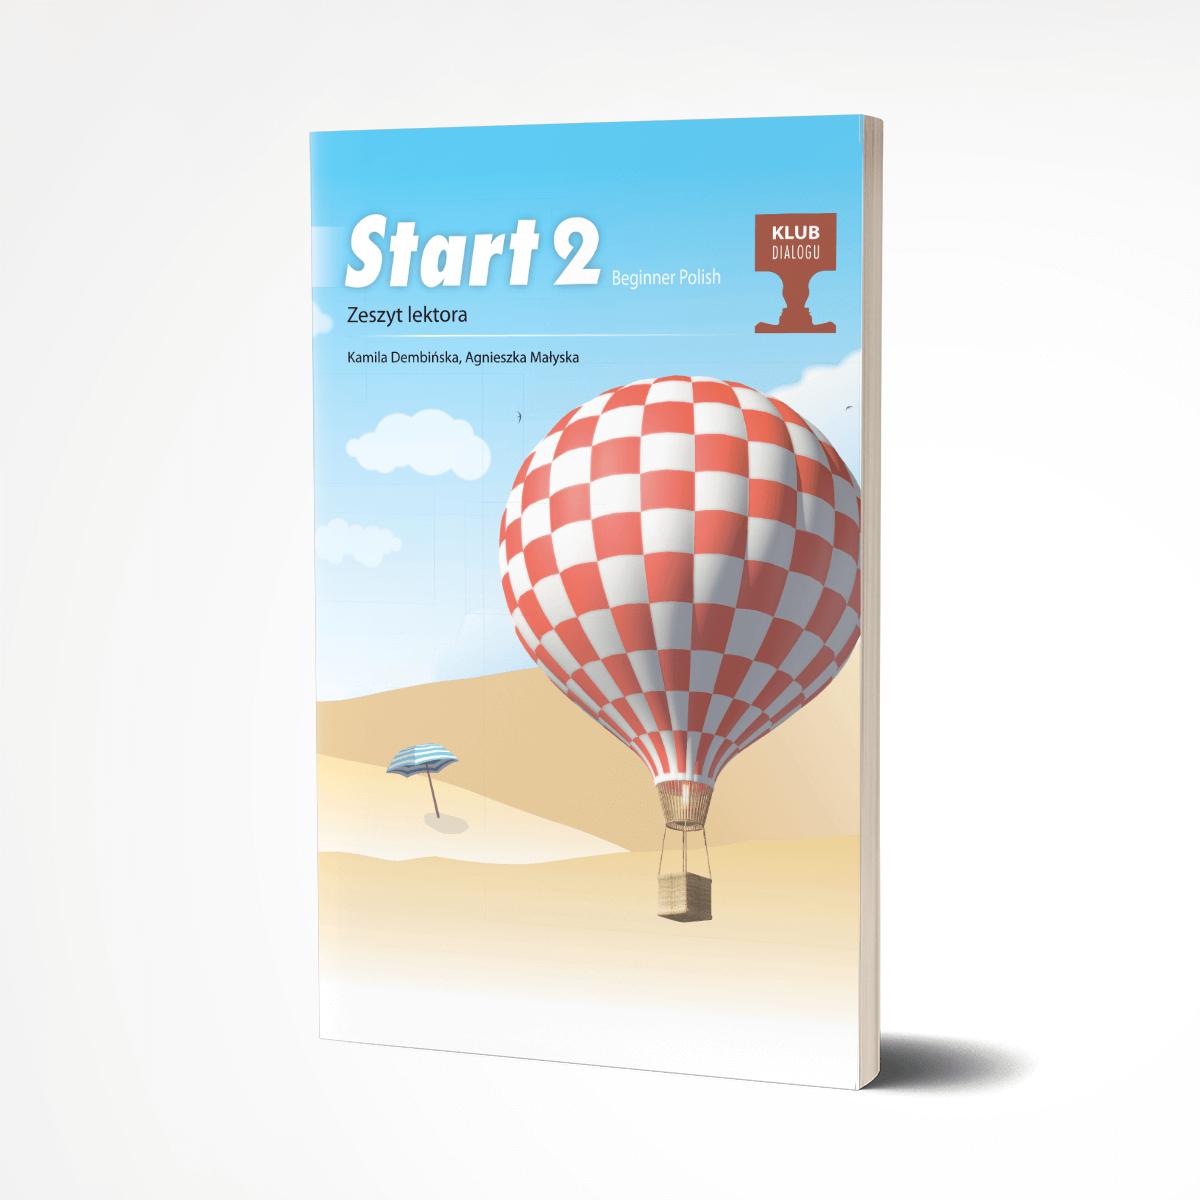 START 2 Zeszyt Lektora PDF